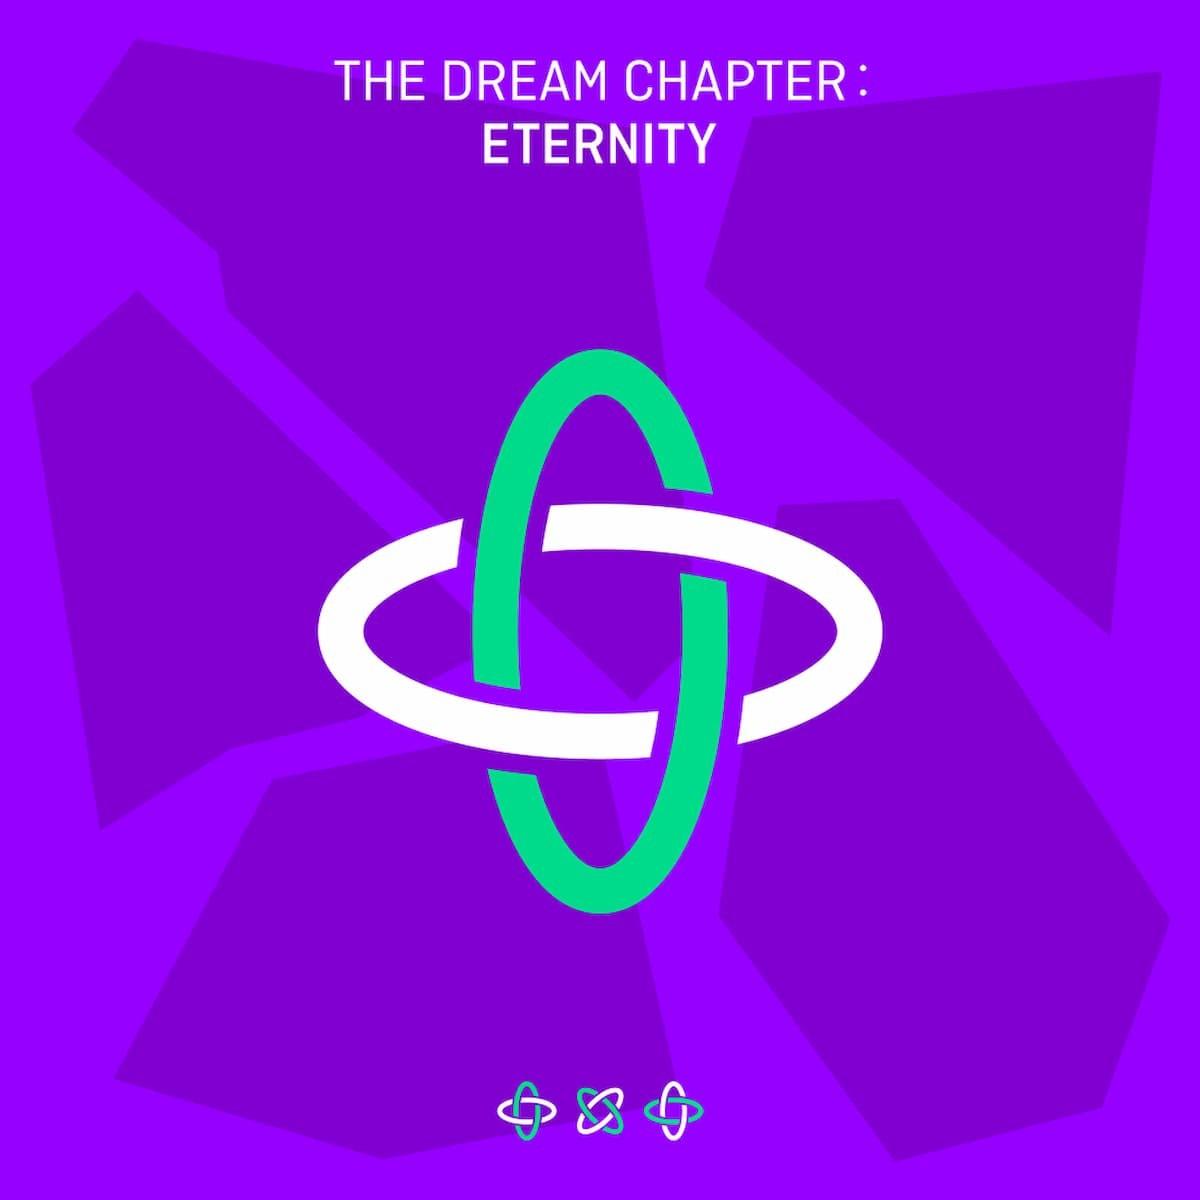 TXT, sale el nuevo disco 'The Dream Chapter: Eternity' - Música News